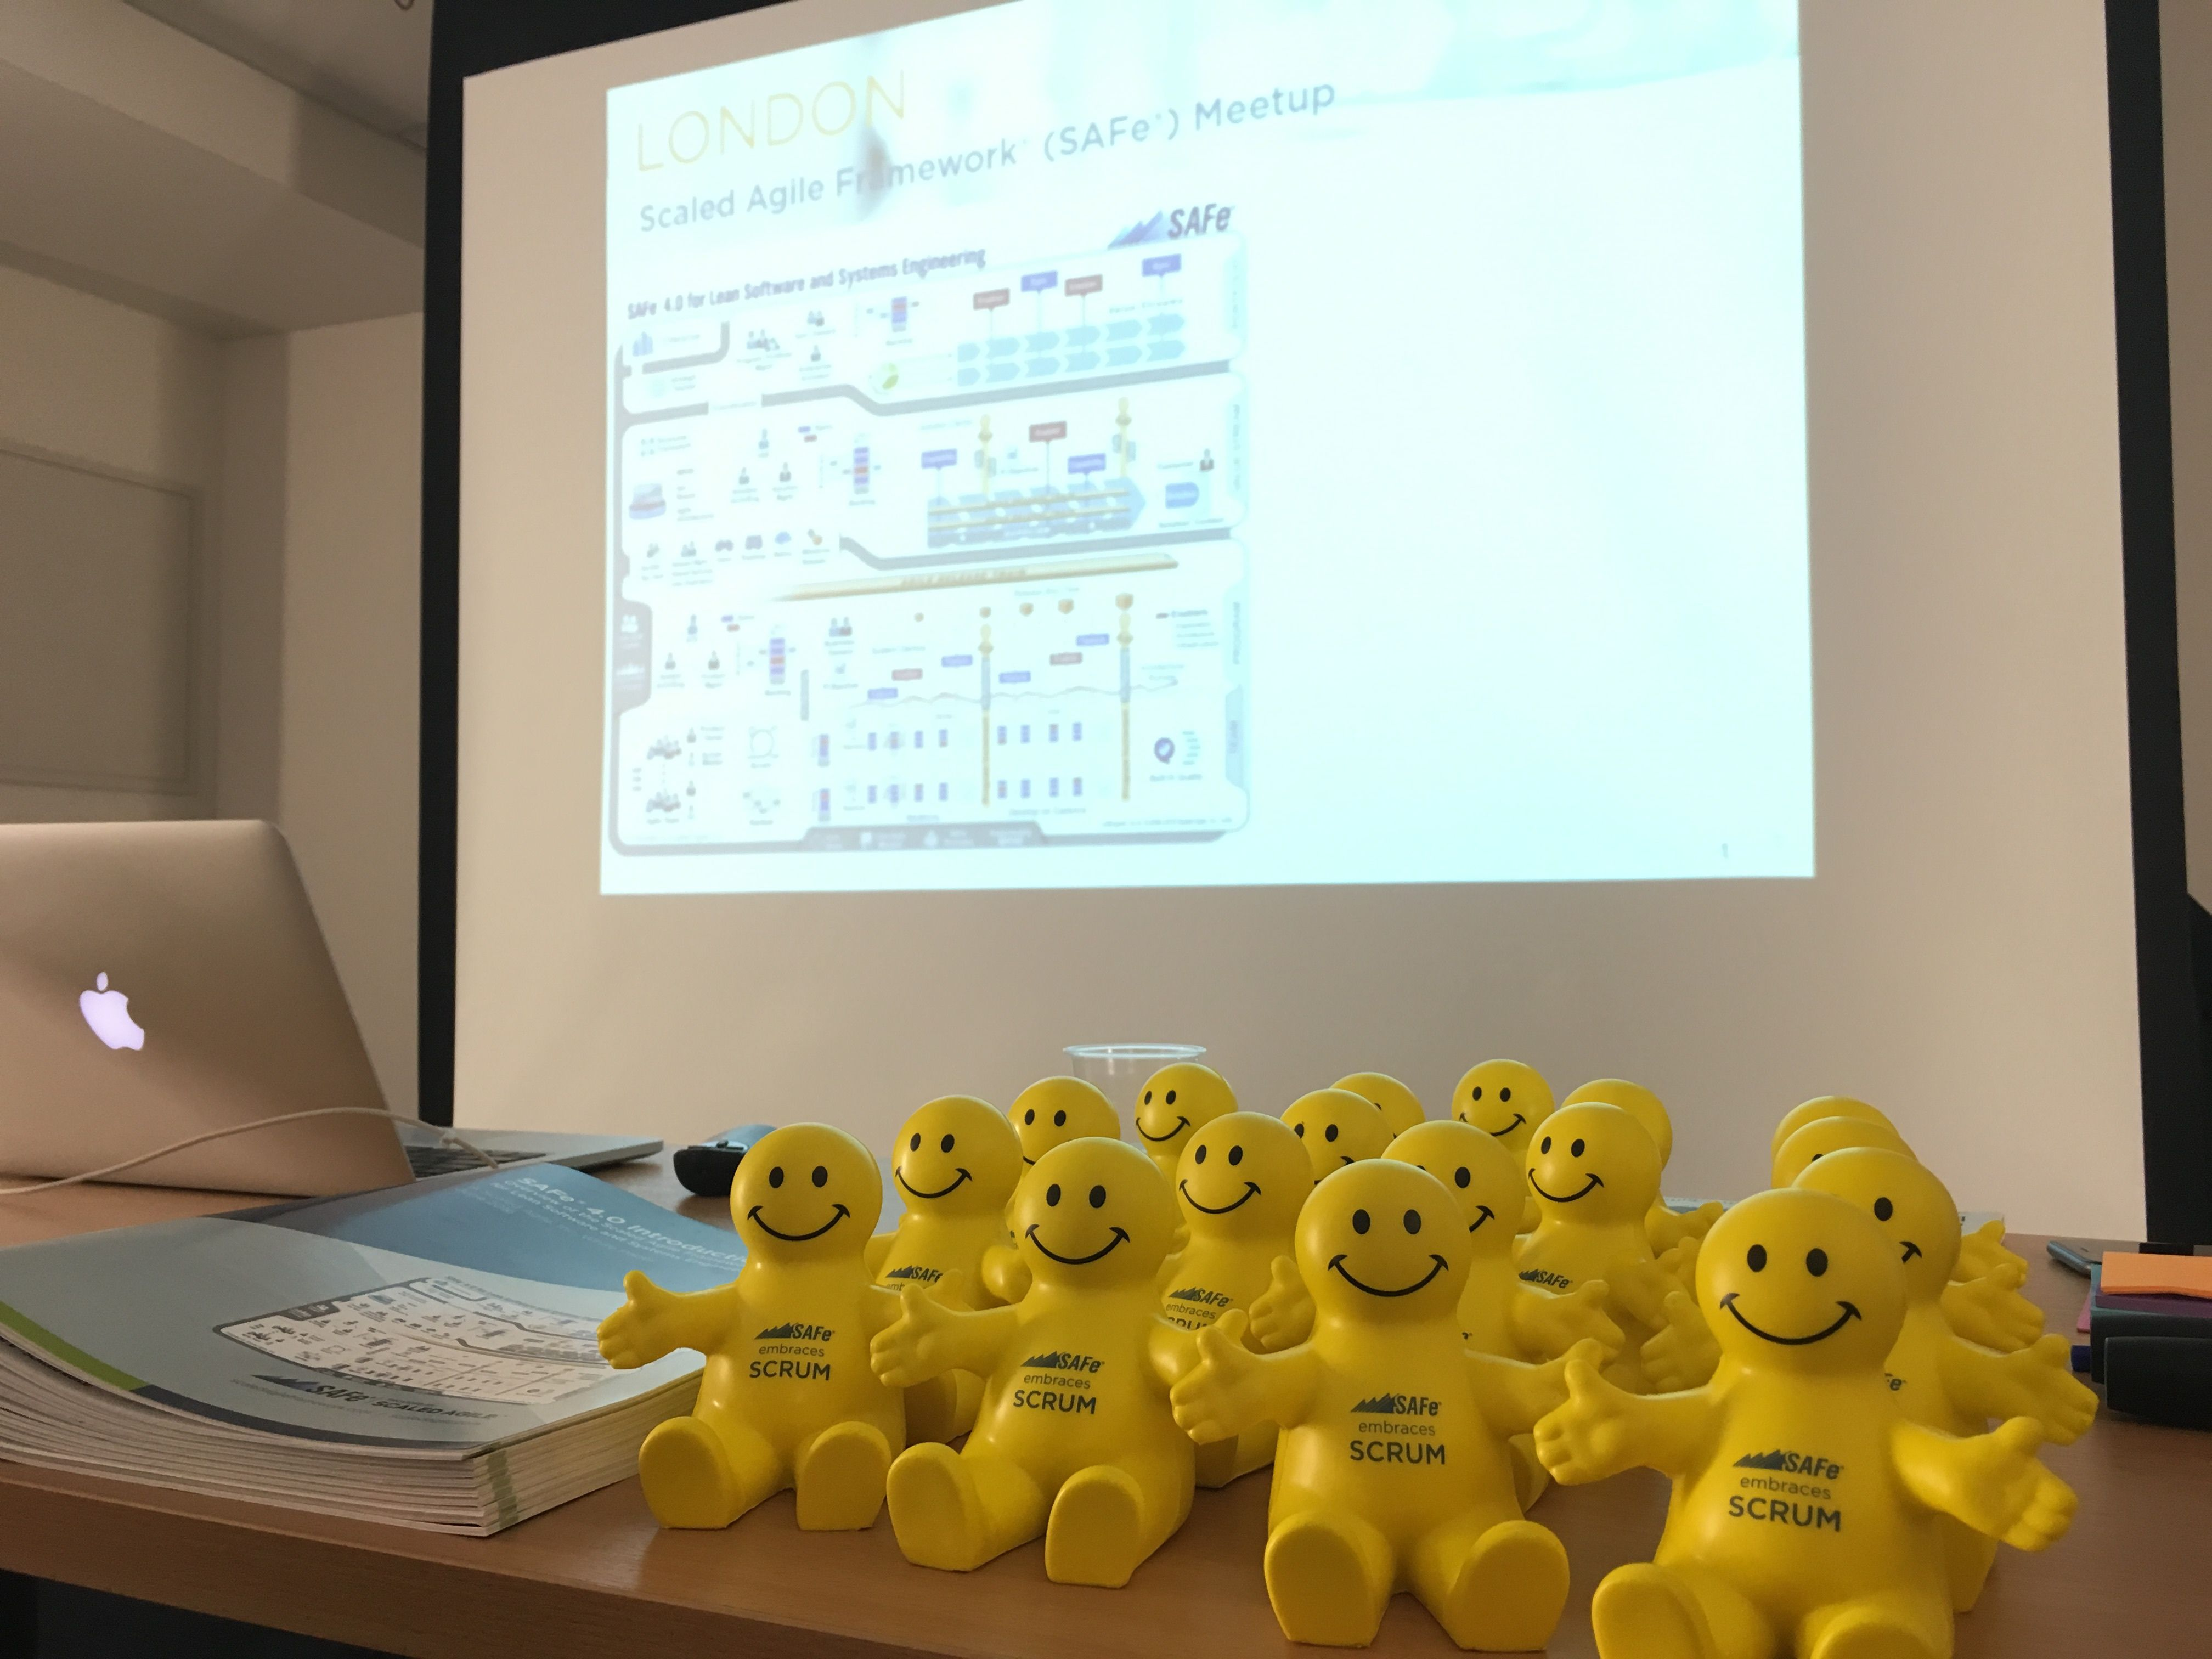 London Scaled Agile Framework® (SAFe ™) Meetup